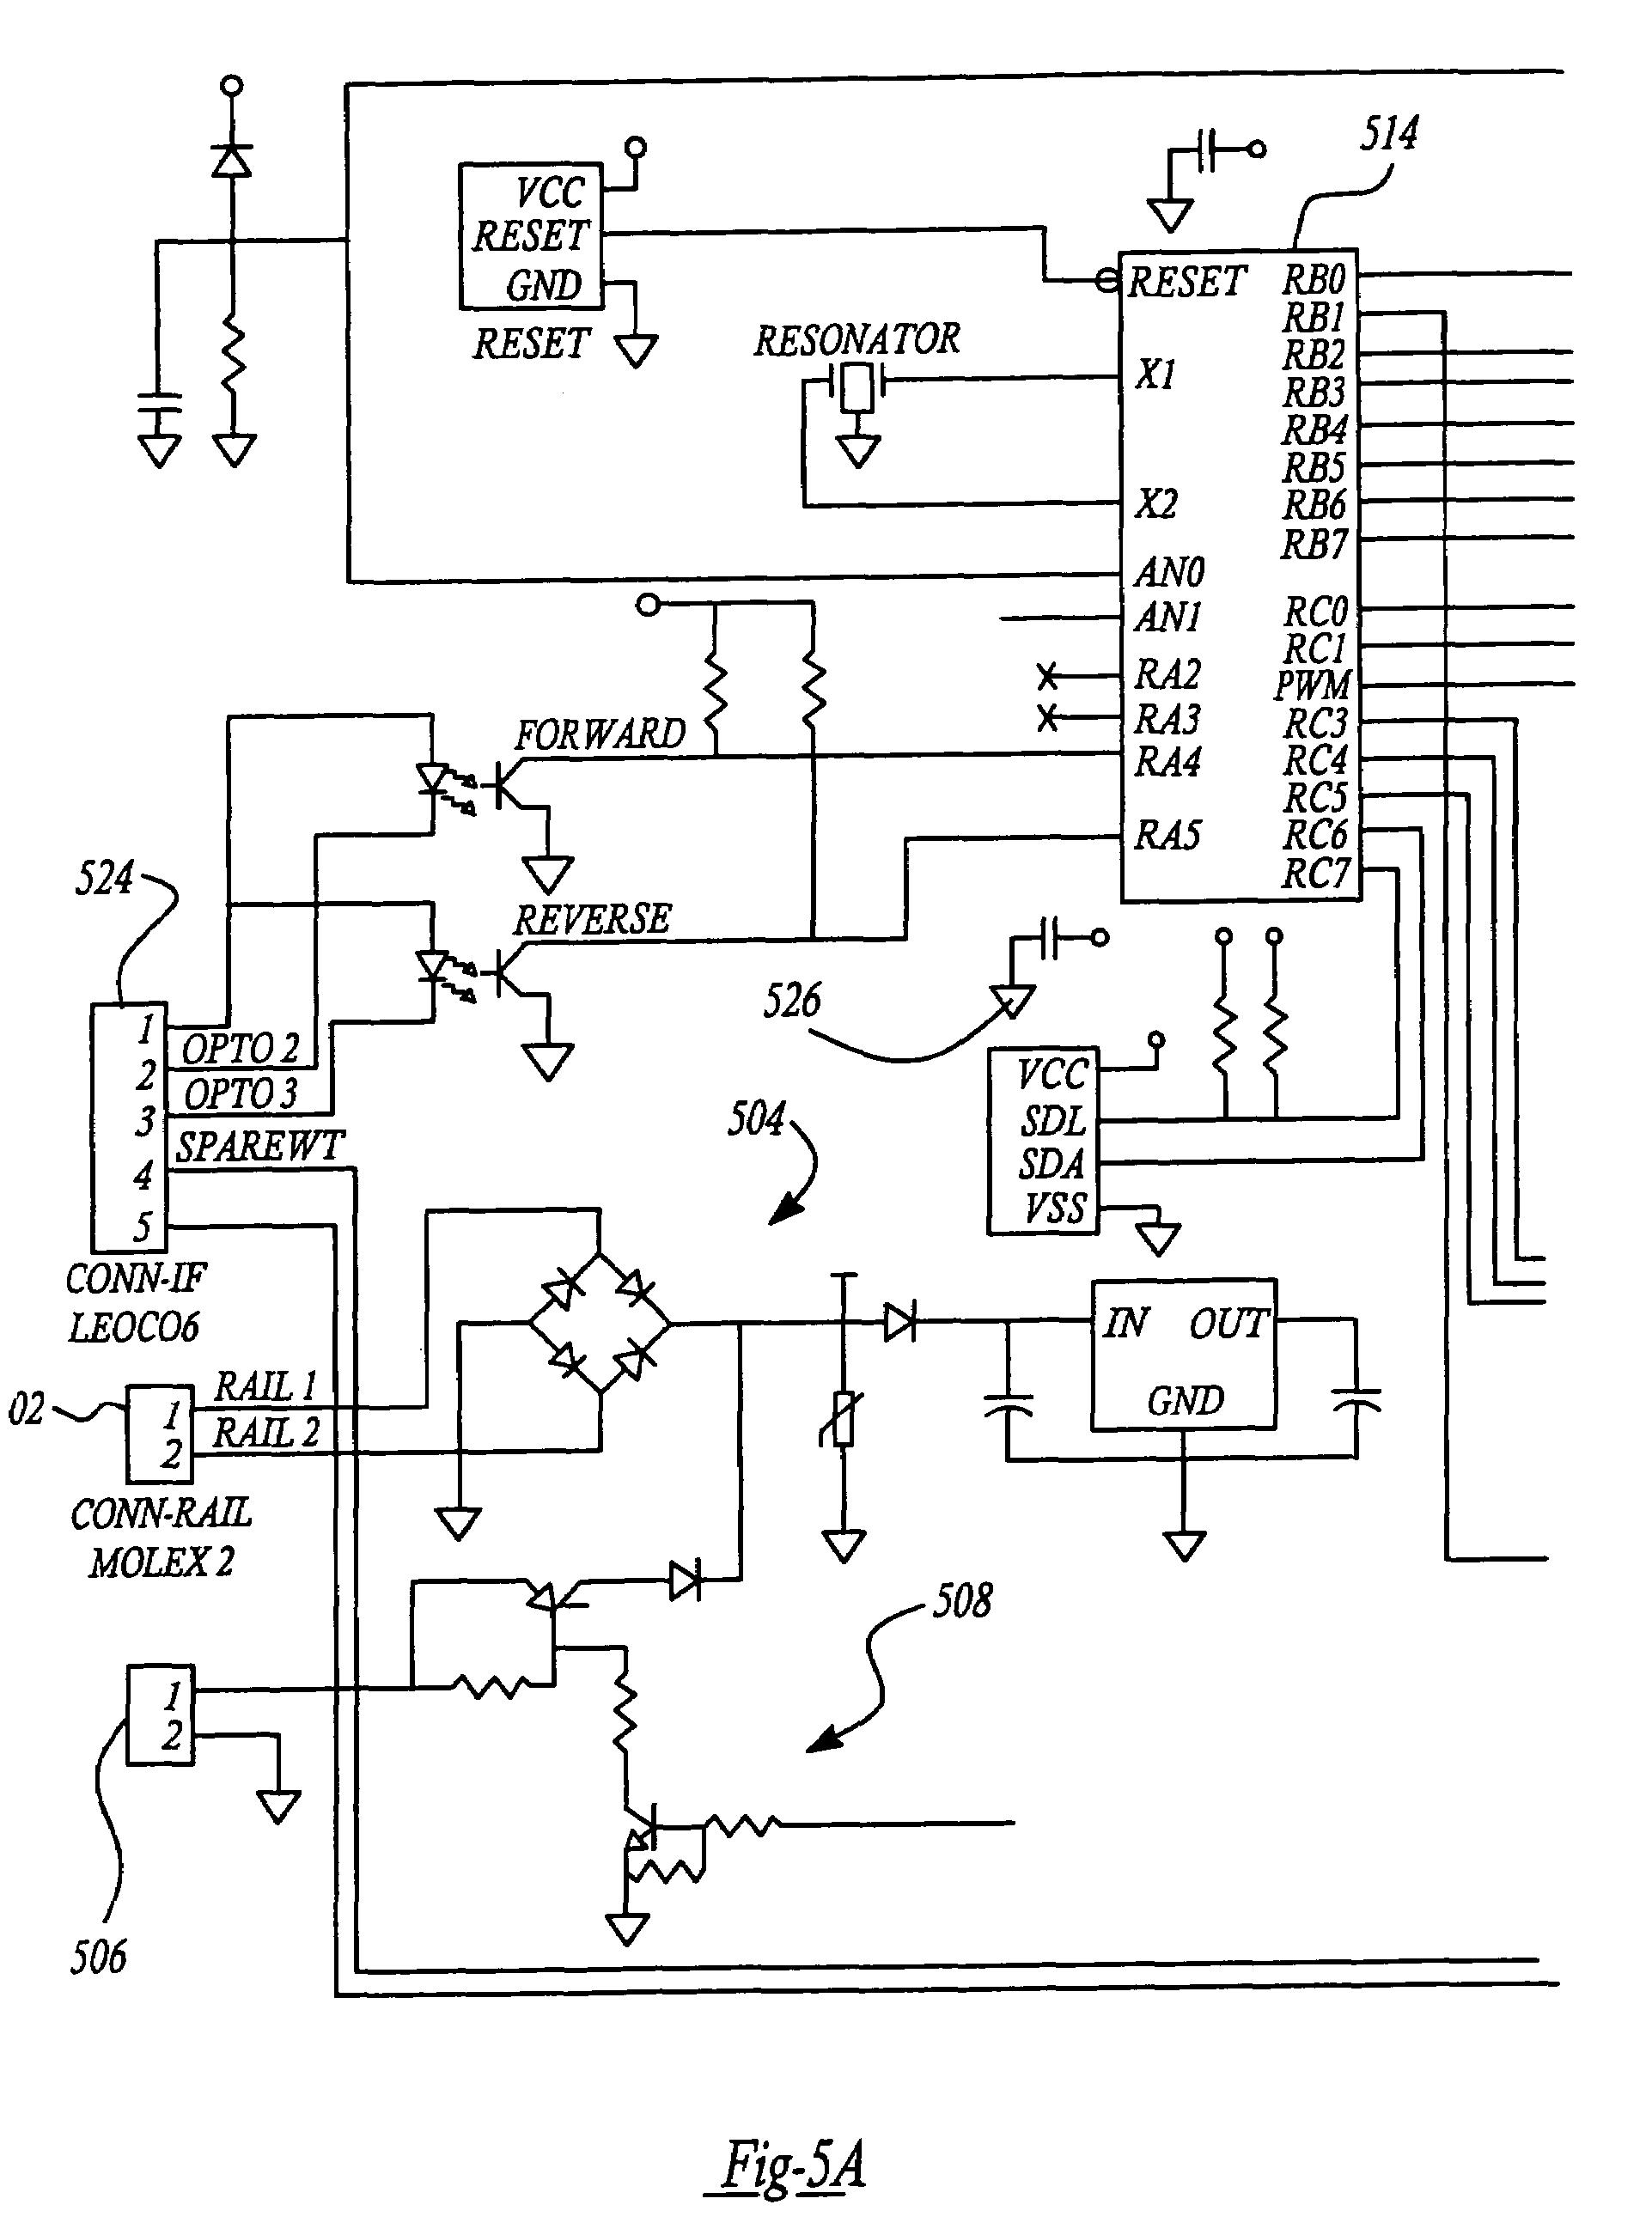 Fantastisch Honda 400ex Schaltplan Ideen - Elektrische Schaltplan ...